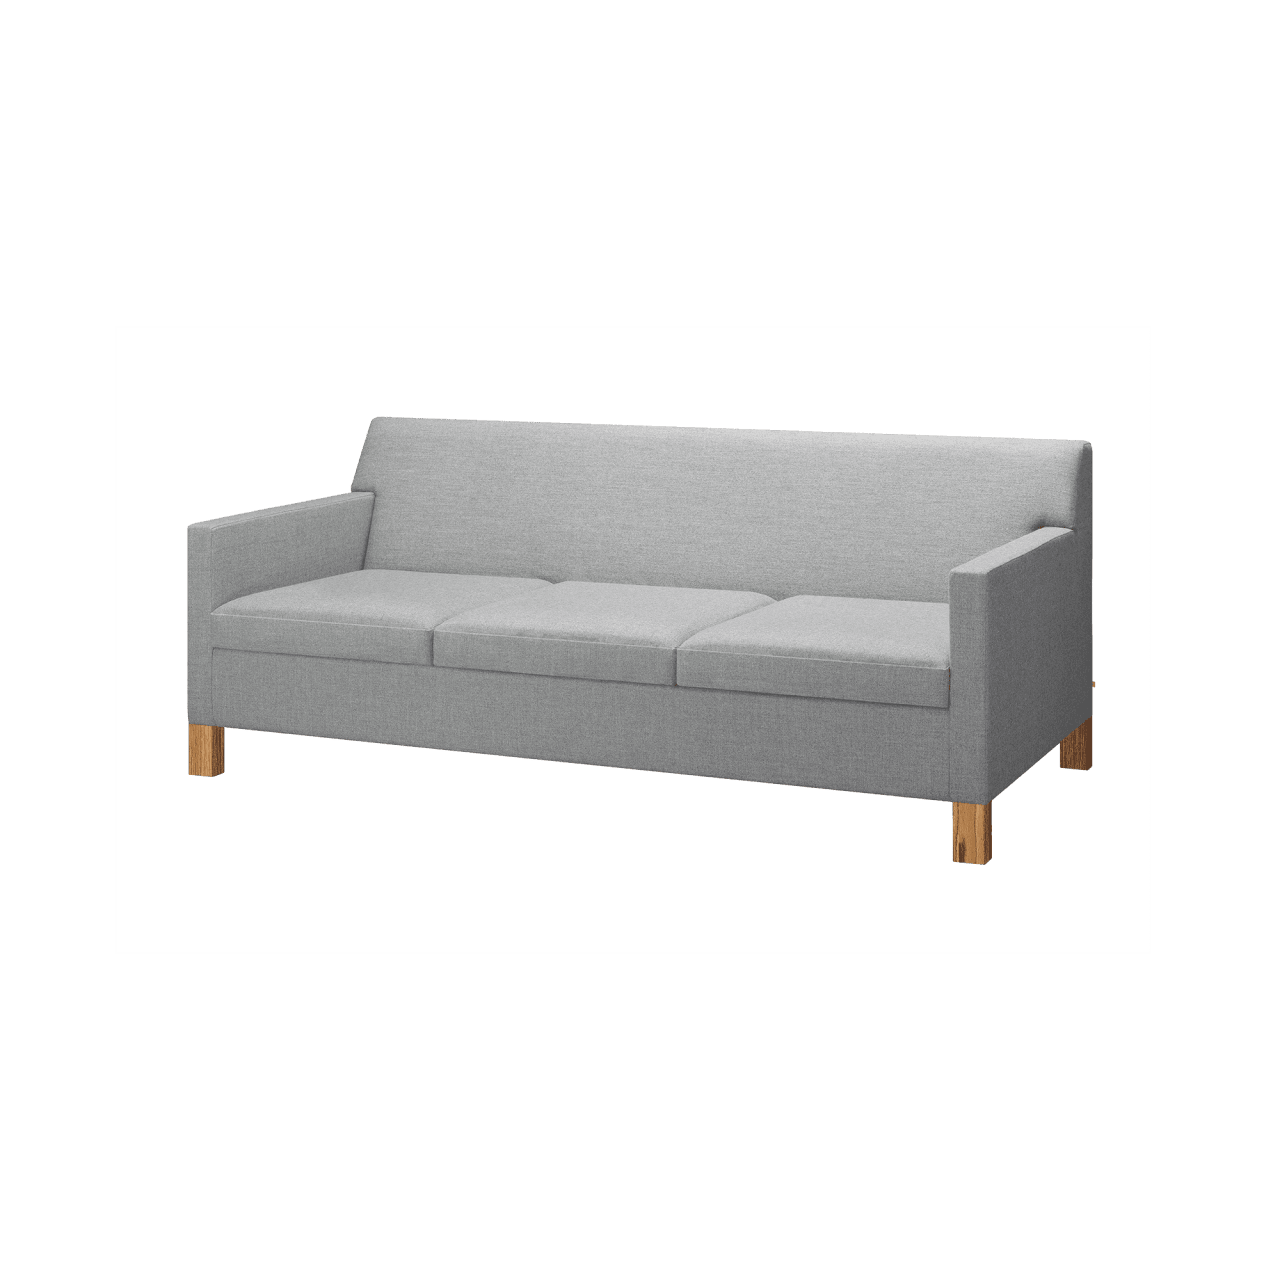 FK09 Westhausen Sofa